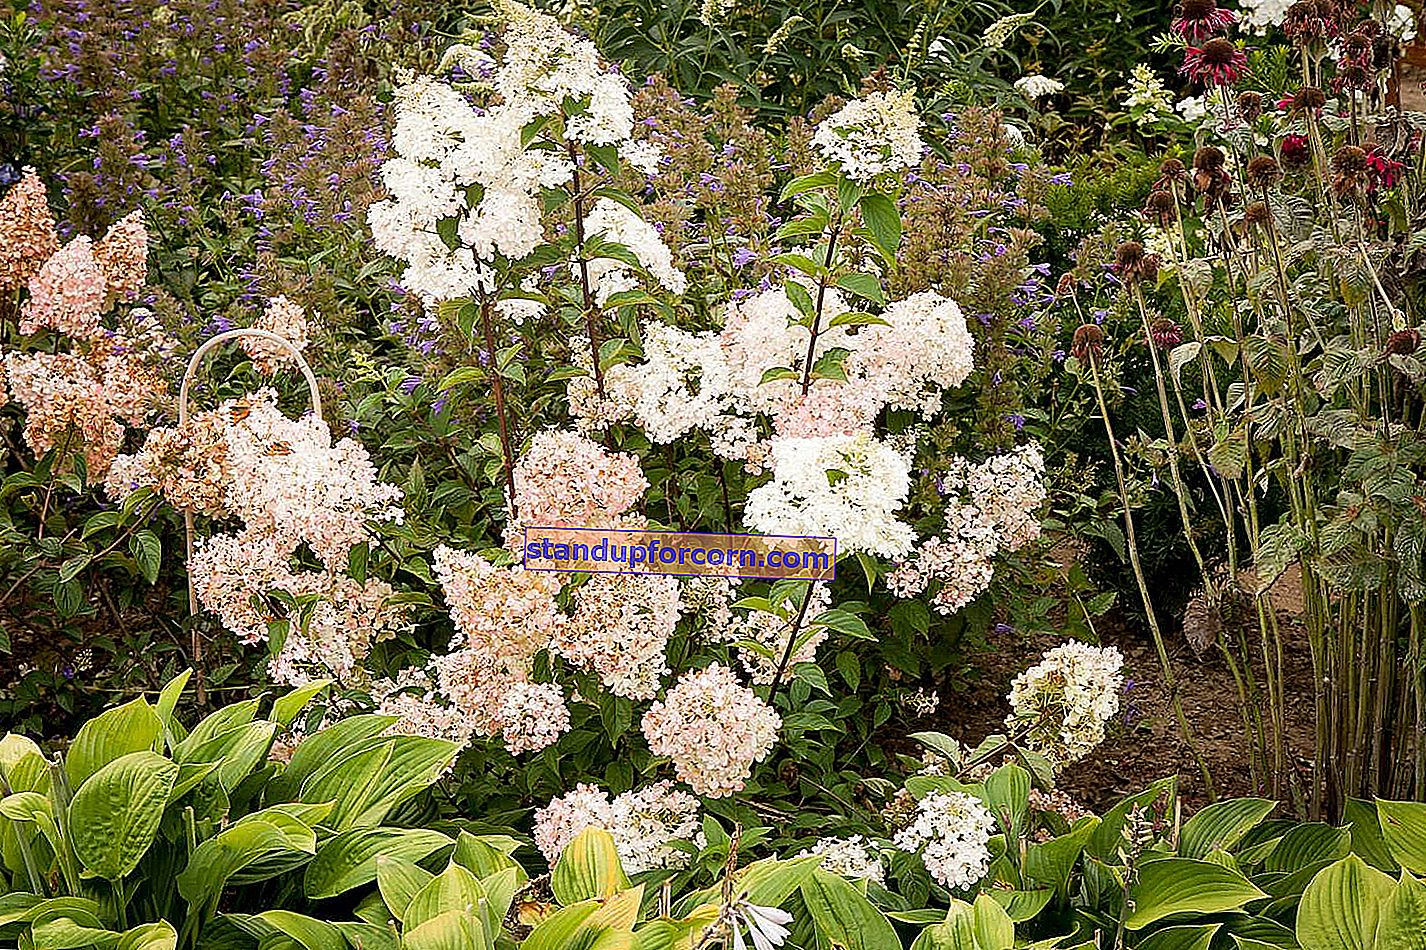 Buket hortensia - sorter, dyrkning, opskæring